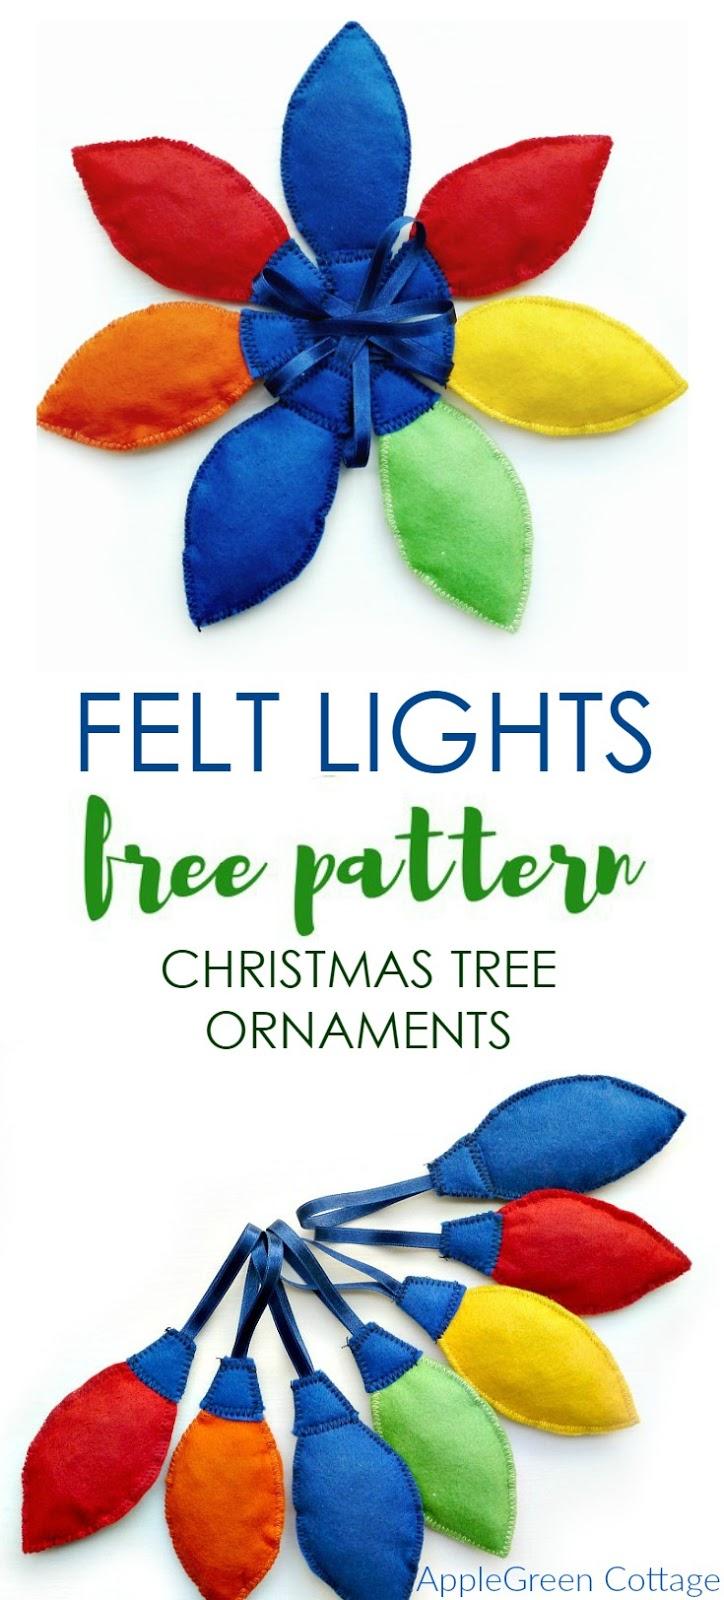 Cute DIY Christmas Tree Decorations Tutorial - AppleGreen Cottage